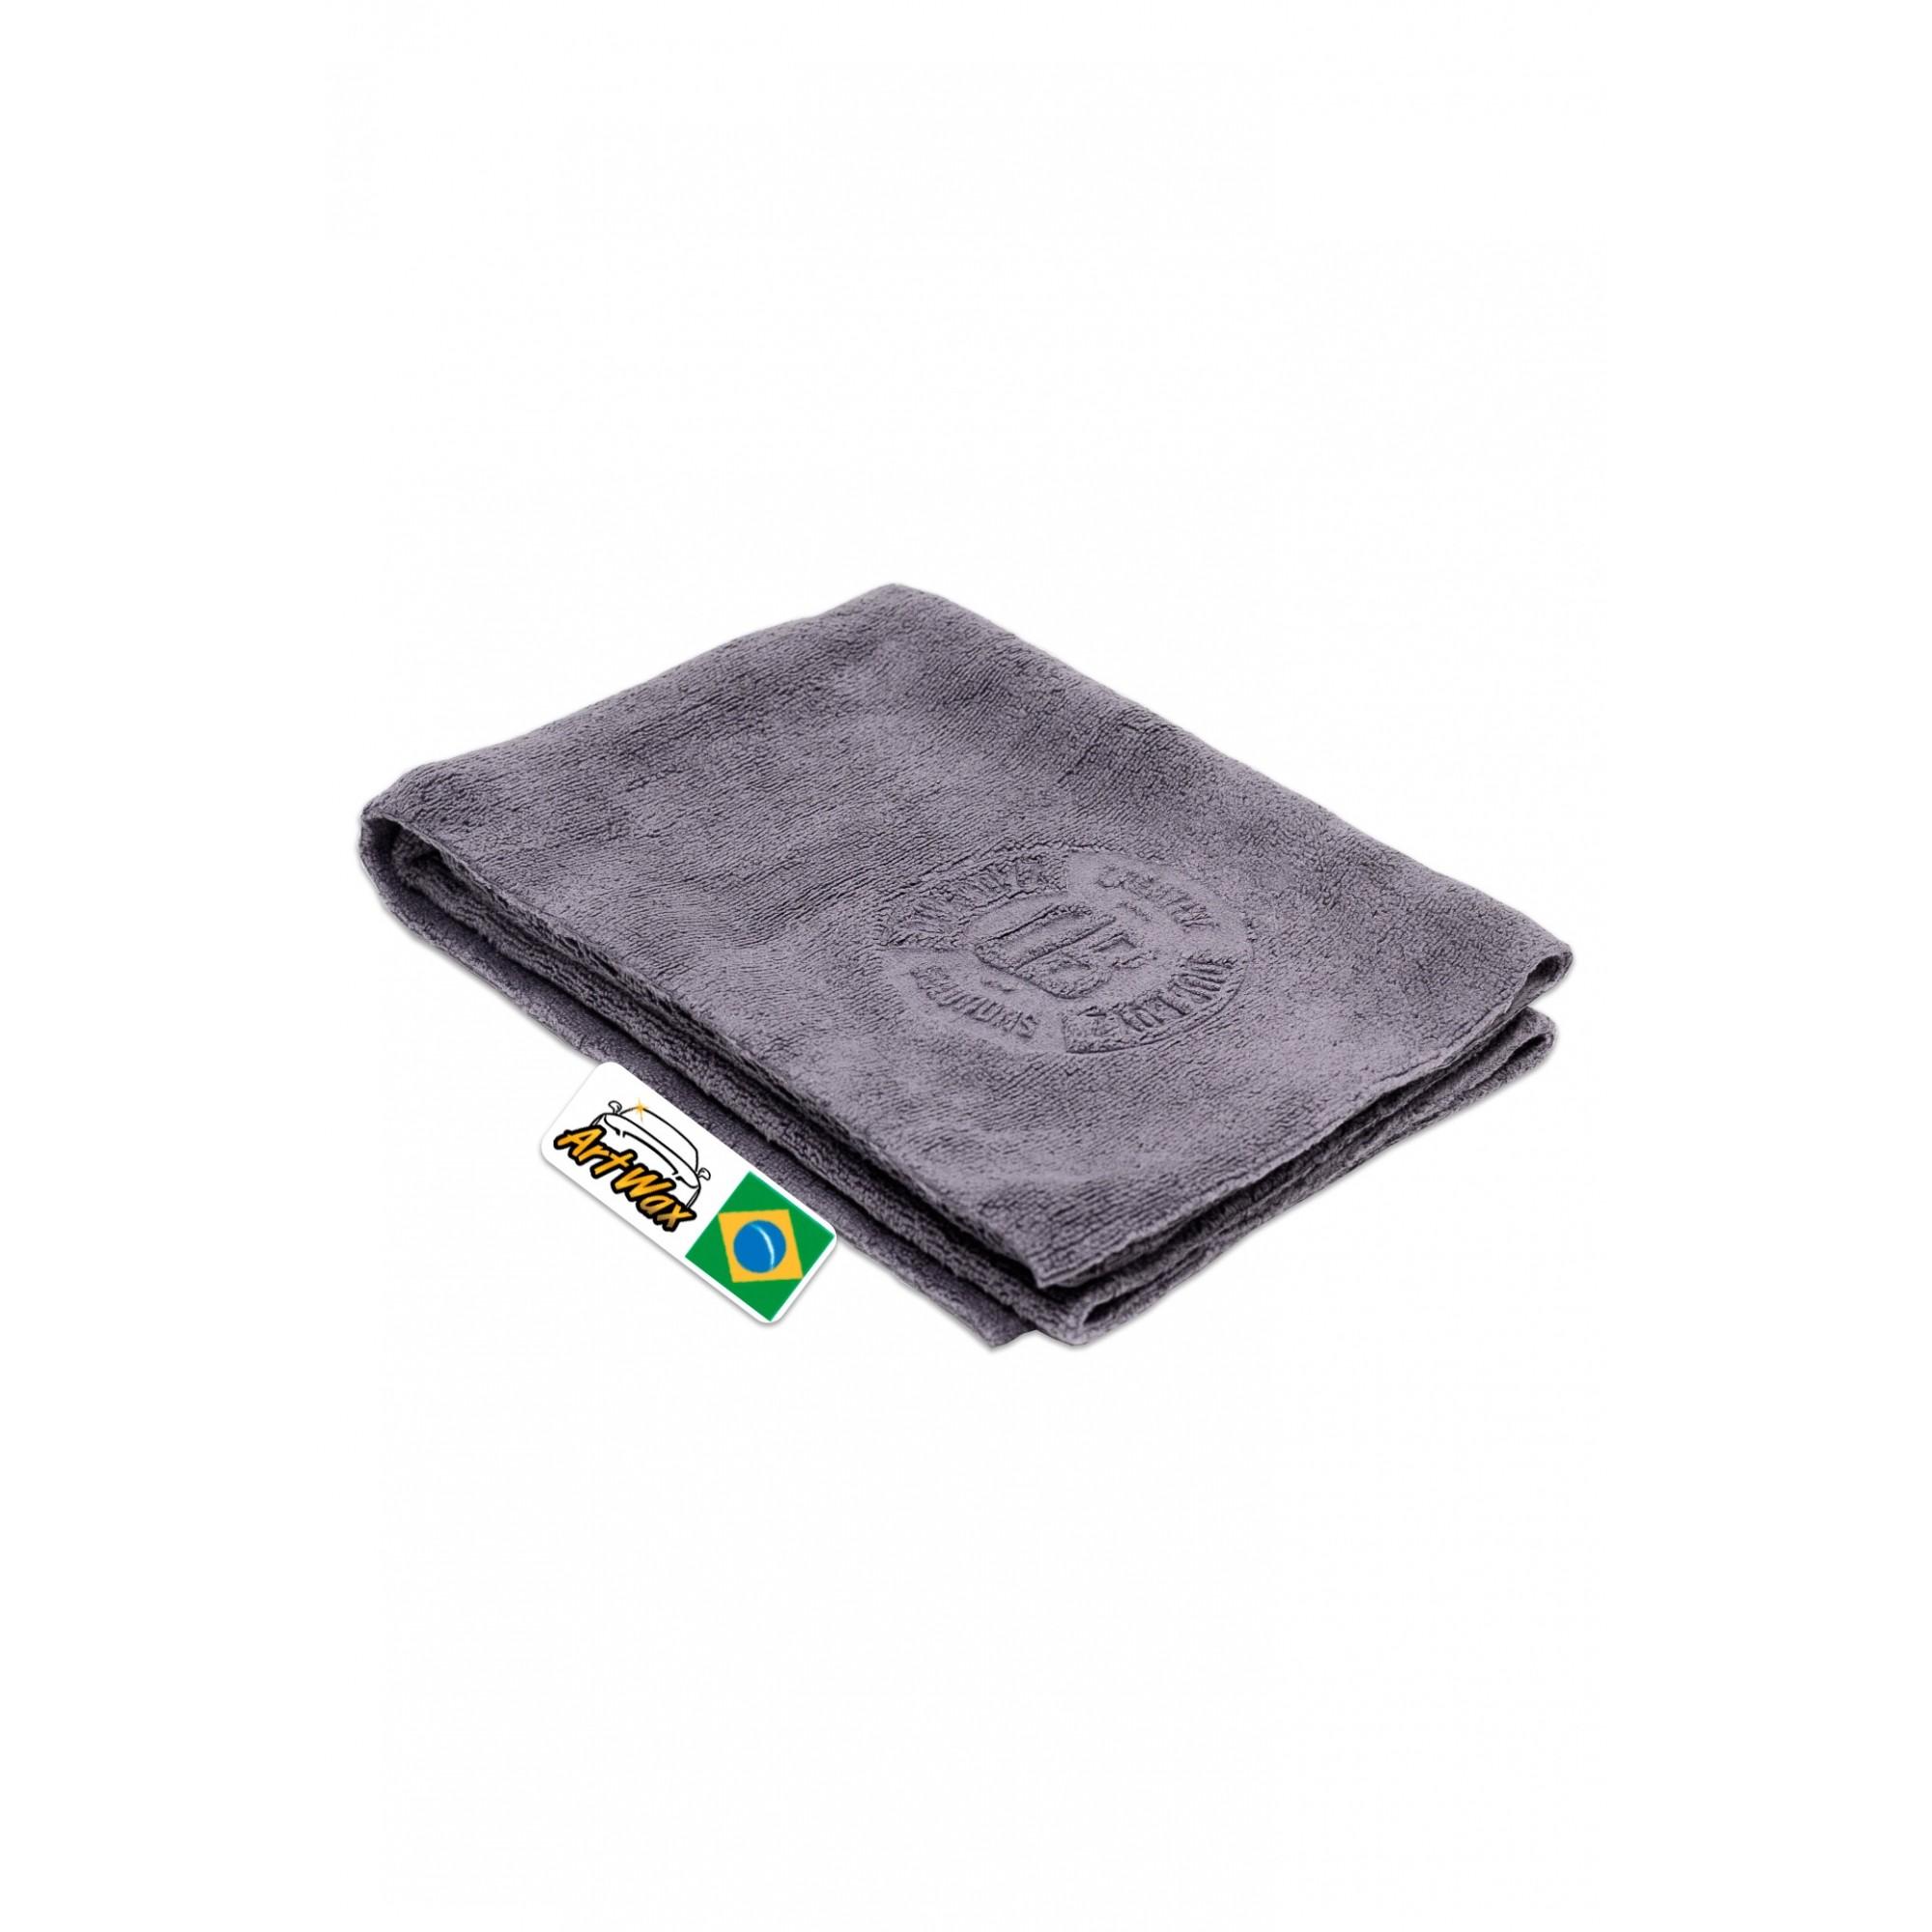 Toalha de Microfibra Cinza DB Towel 40x40cm - 350gsm Dub Boyz